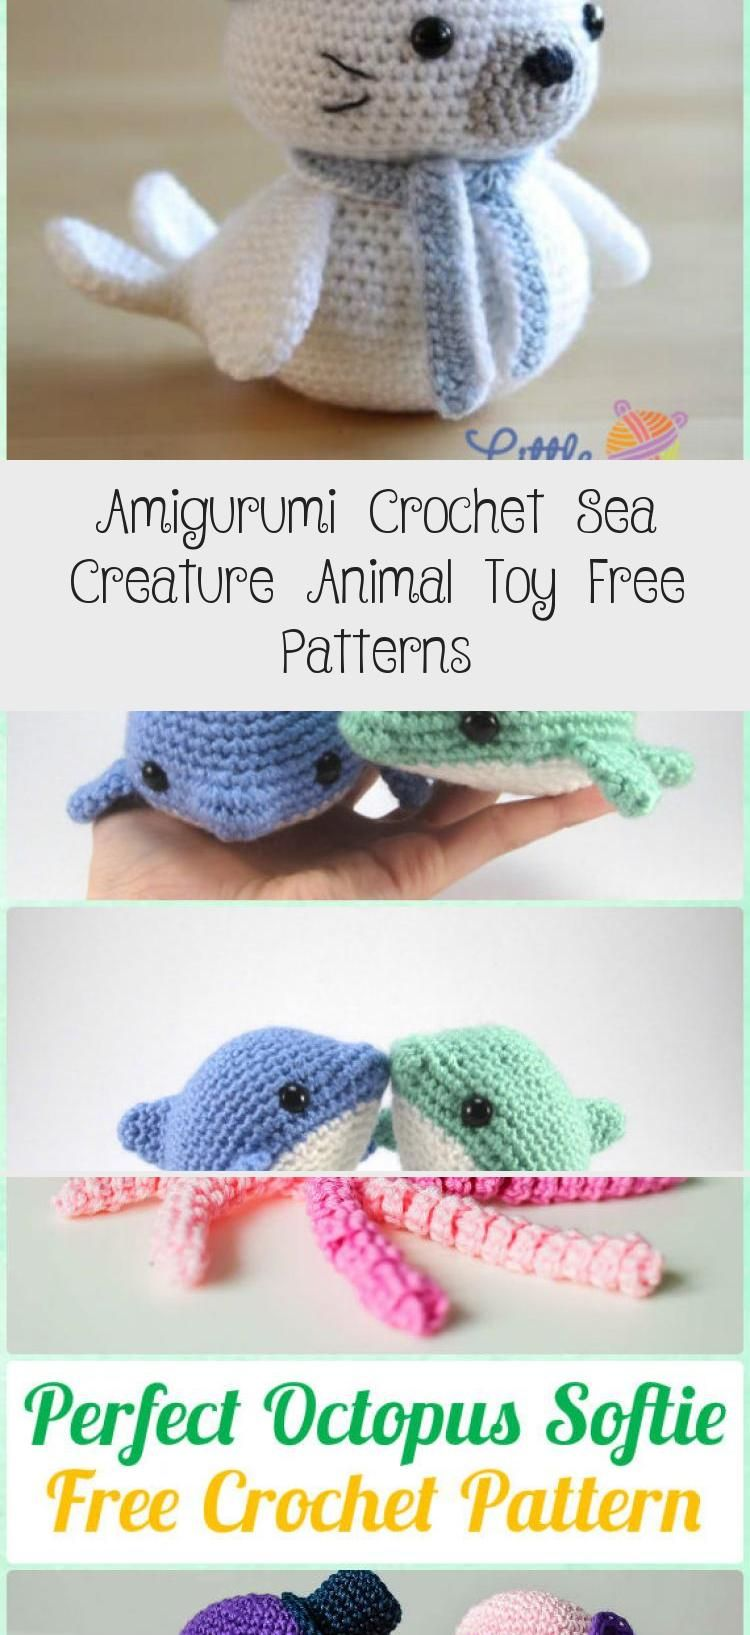 Amigurumi Crochet Sea Creature Animal Toy Free Patterns | 1635x750